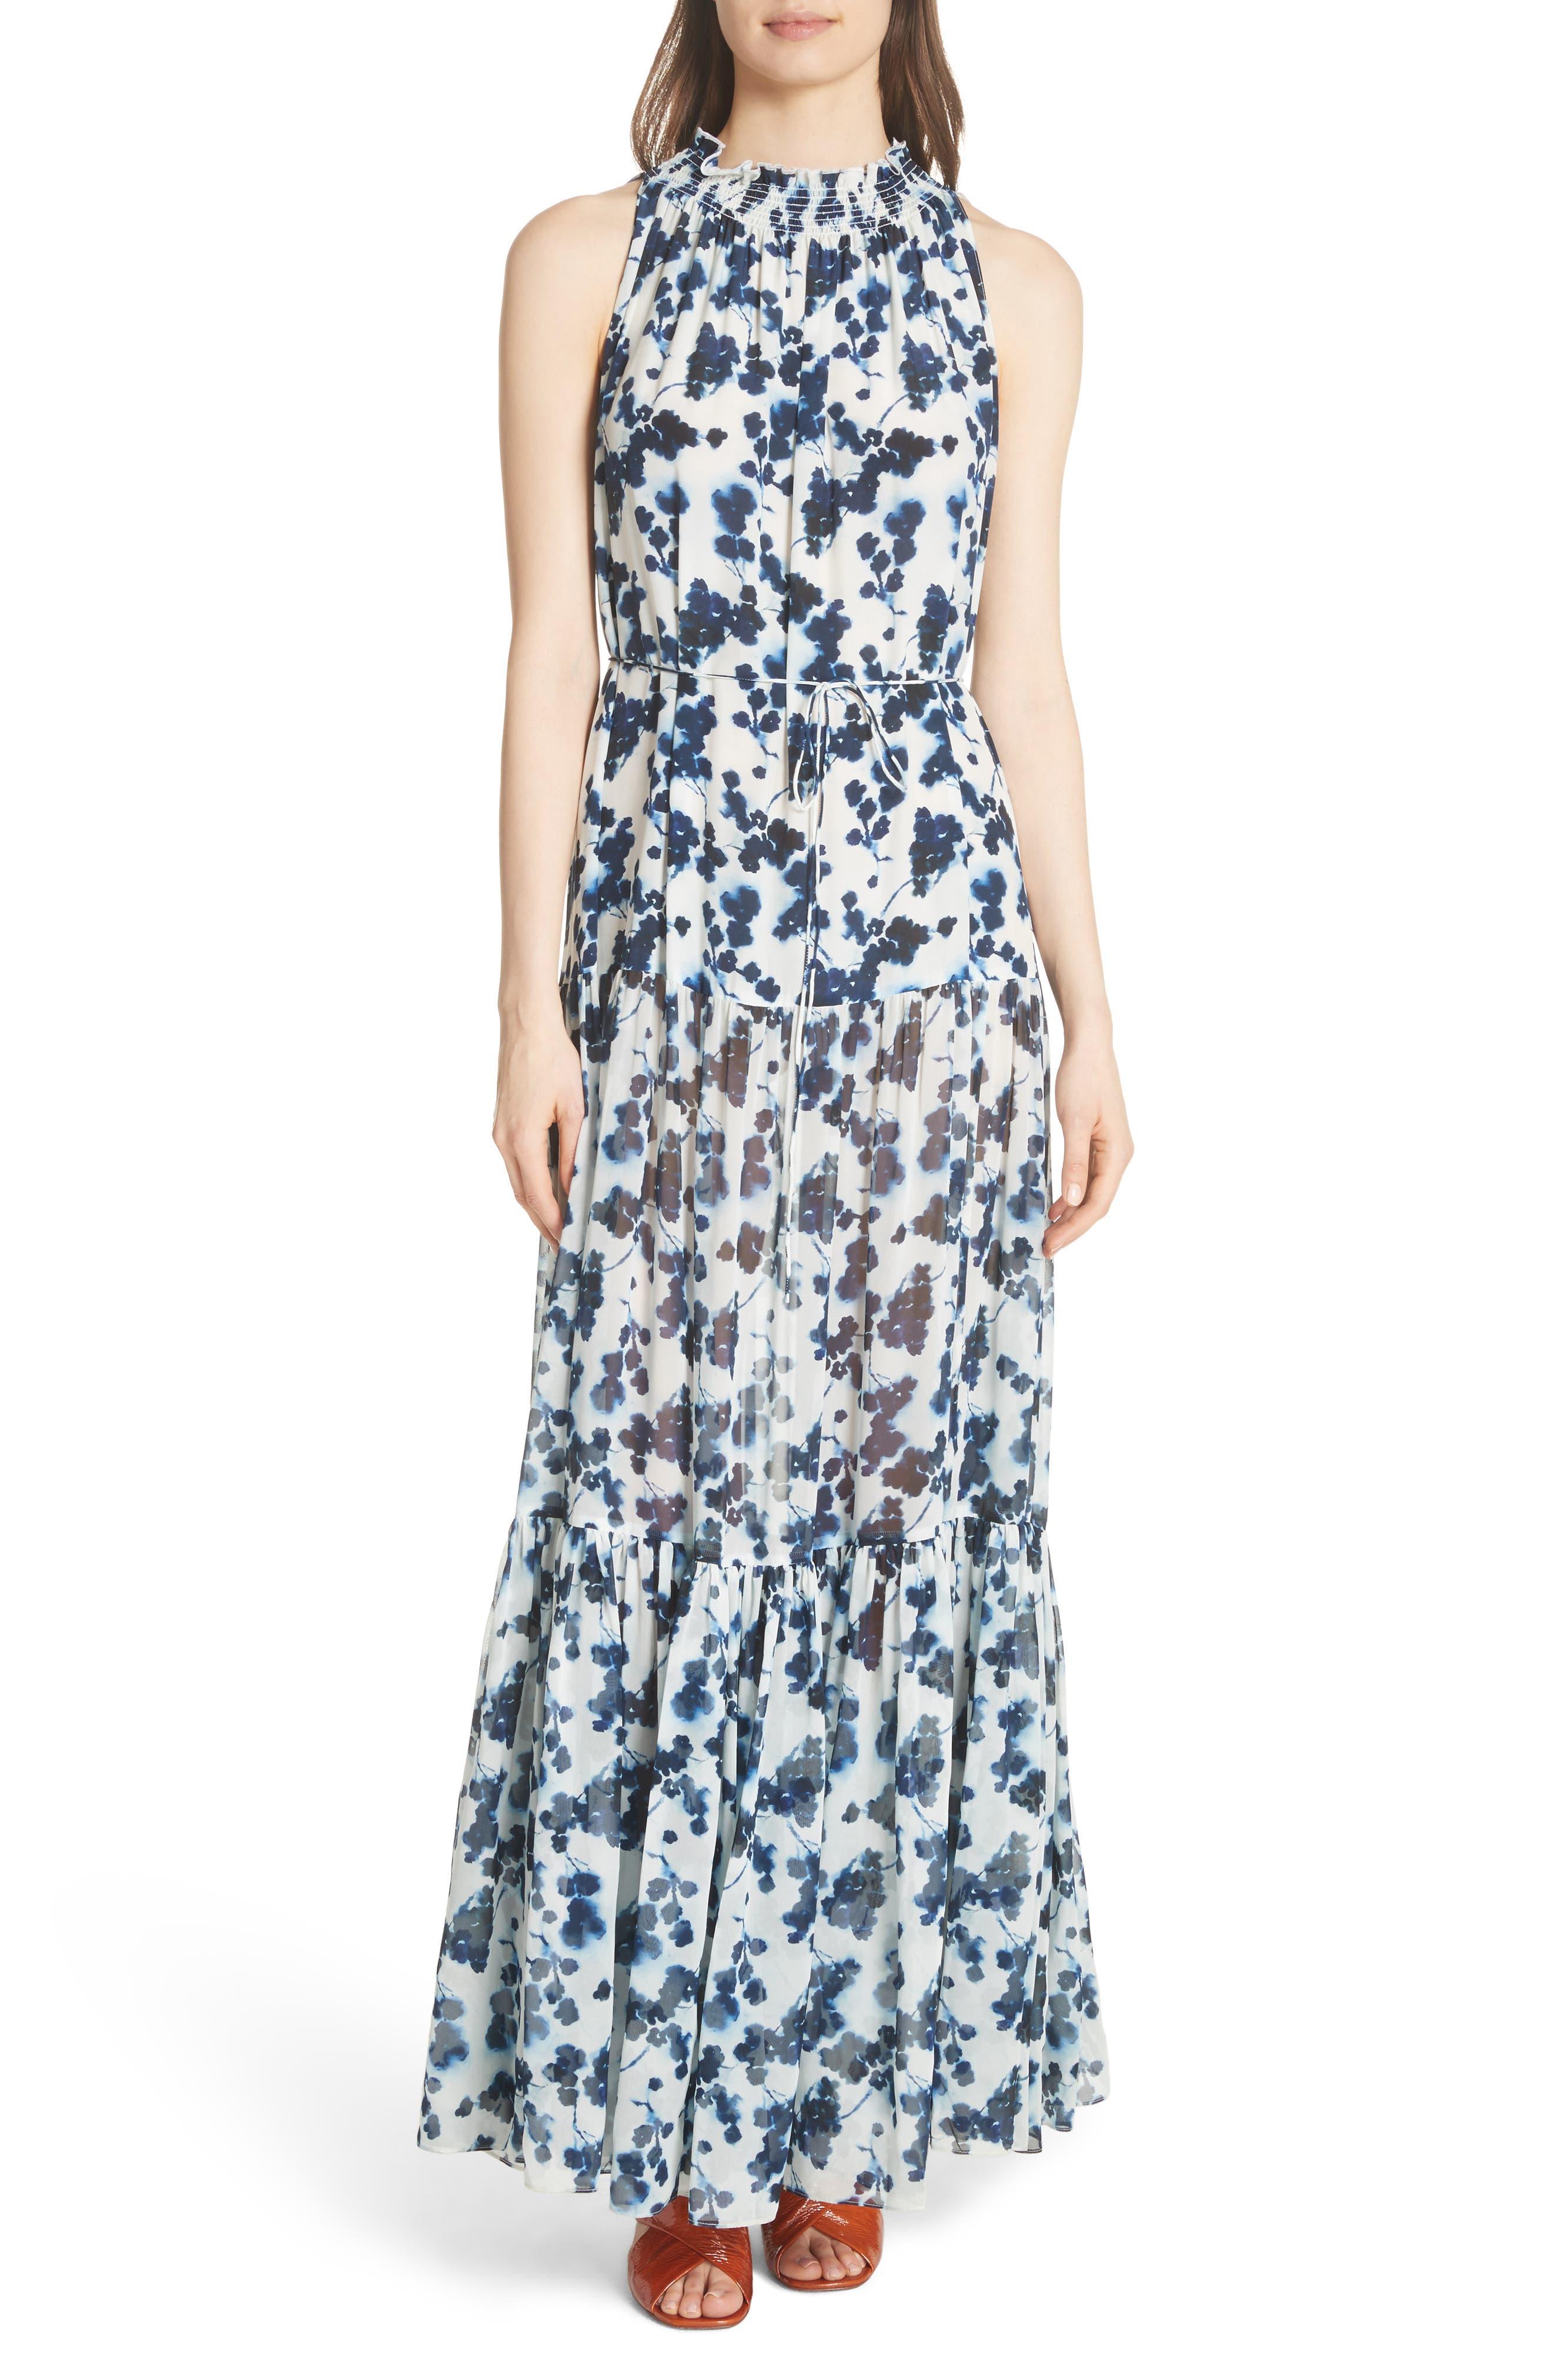 Lani P Floral Print Silk Dress,                             Main thumbnail 1, color,                             426